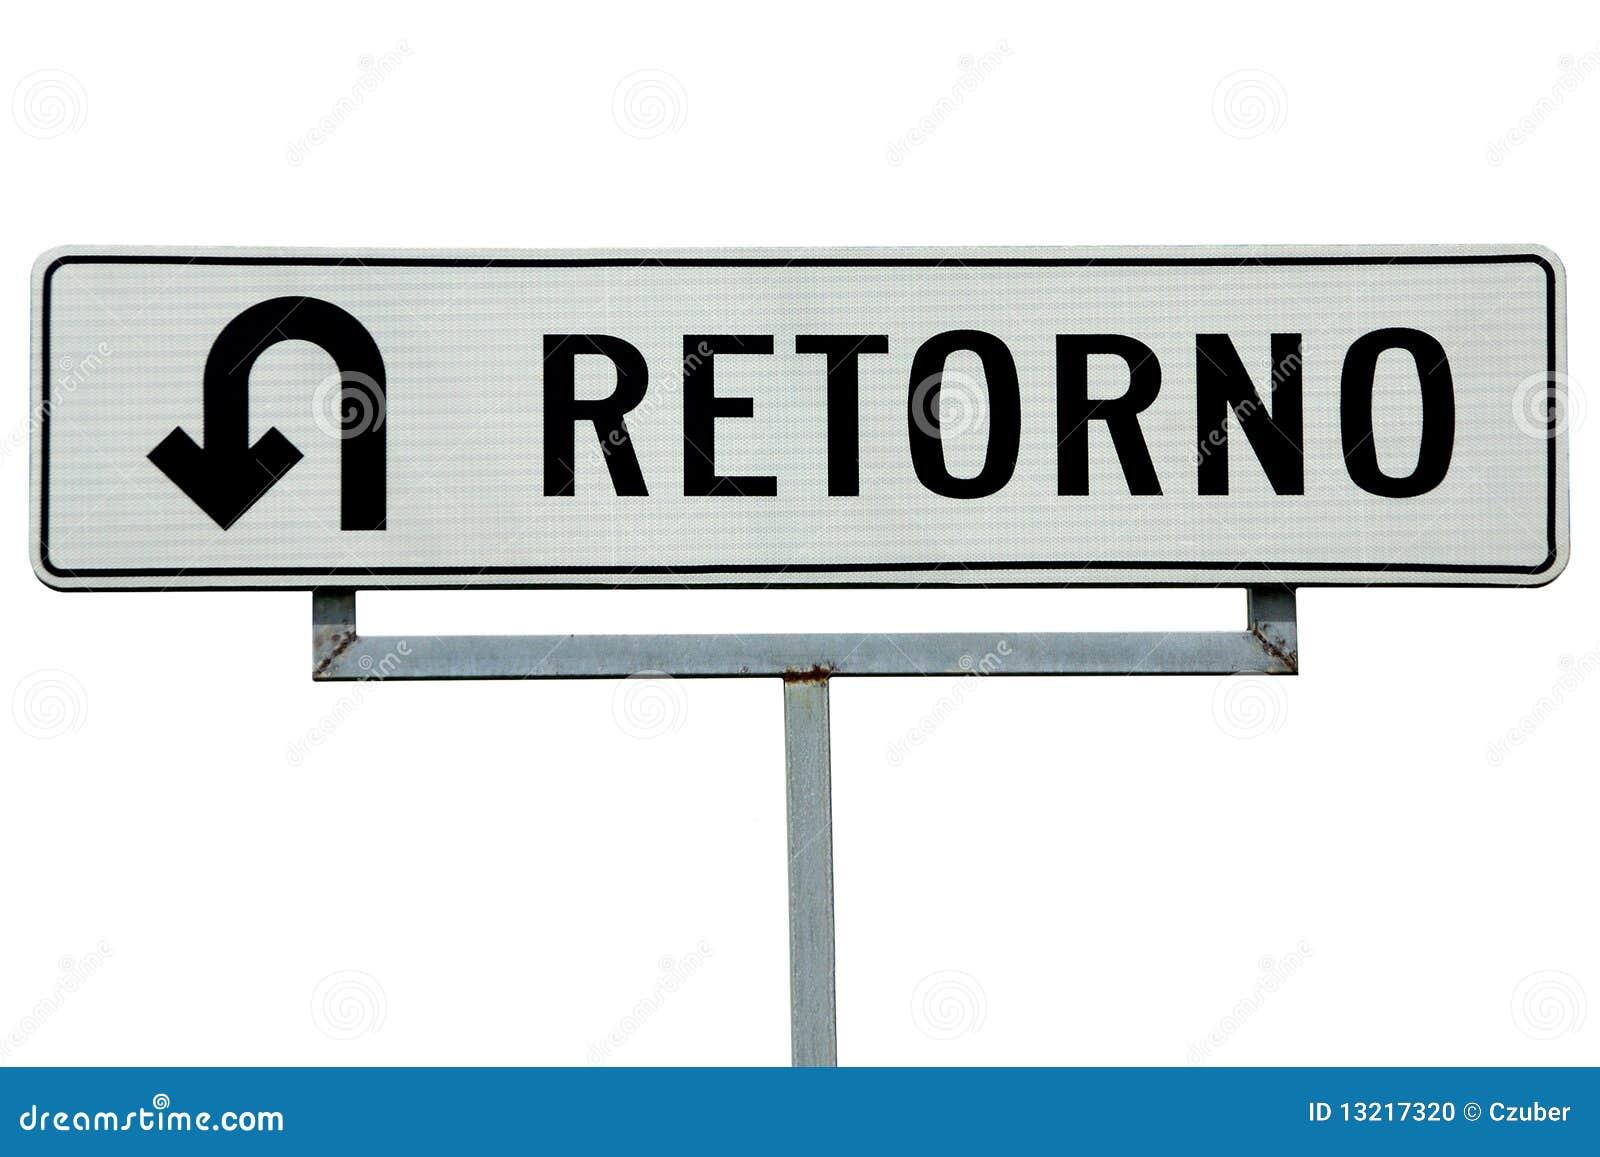 Retorno U-turn Sign Stock Photo - Image: 13217320